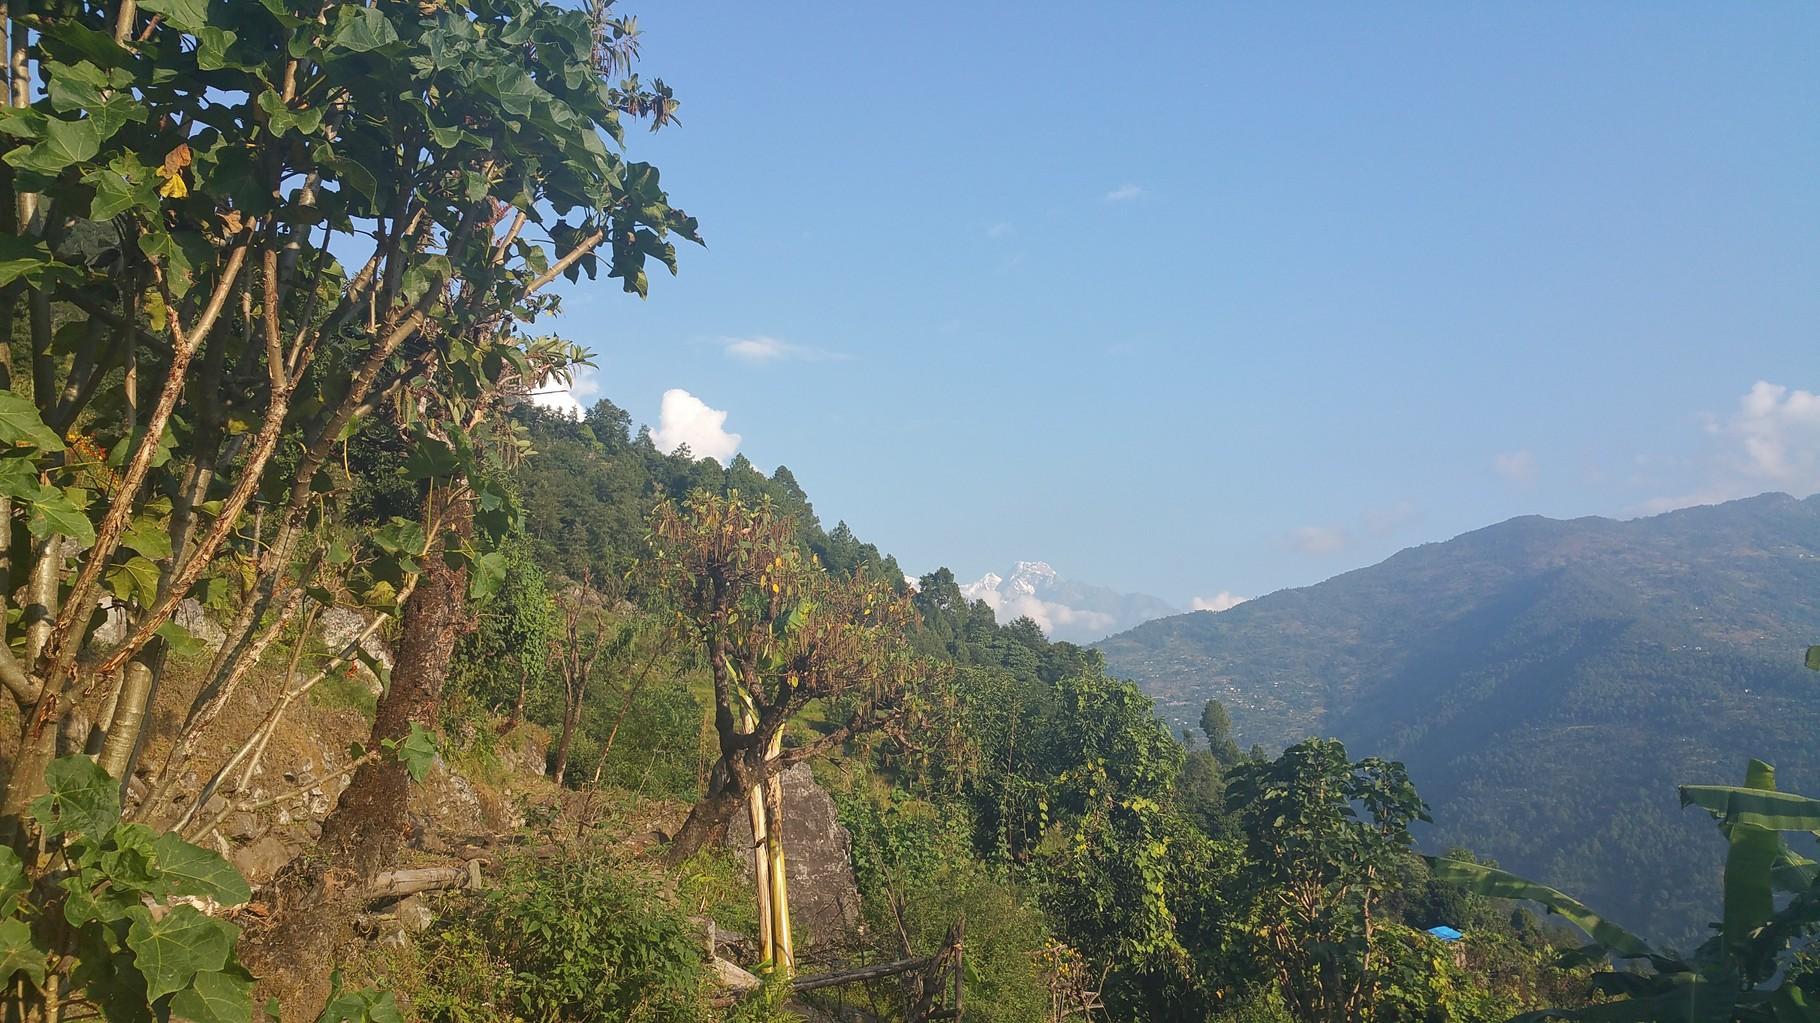 Paysages verdoyants du départ de Phaplu http://www.shangrila-trek.com/trek-peak-mera/